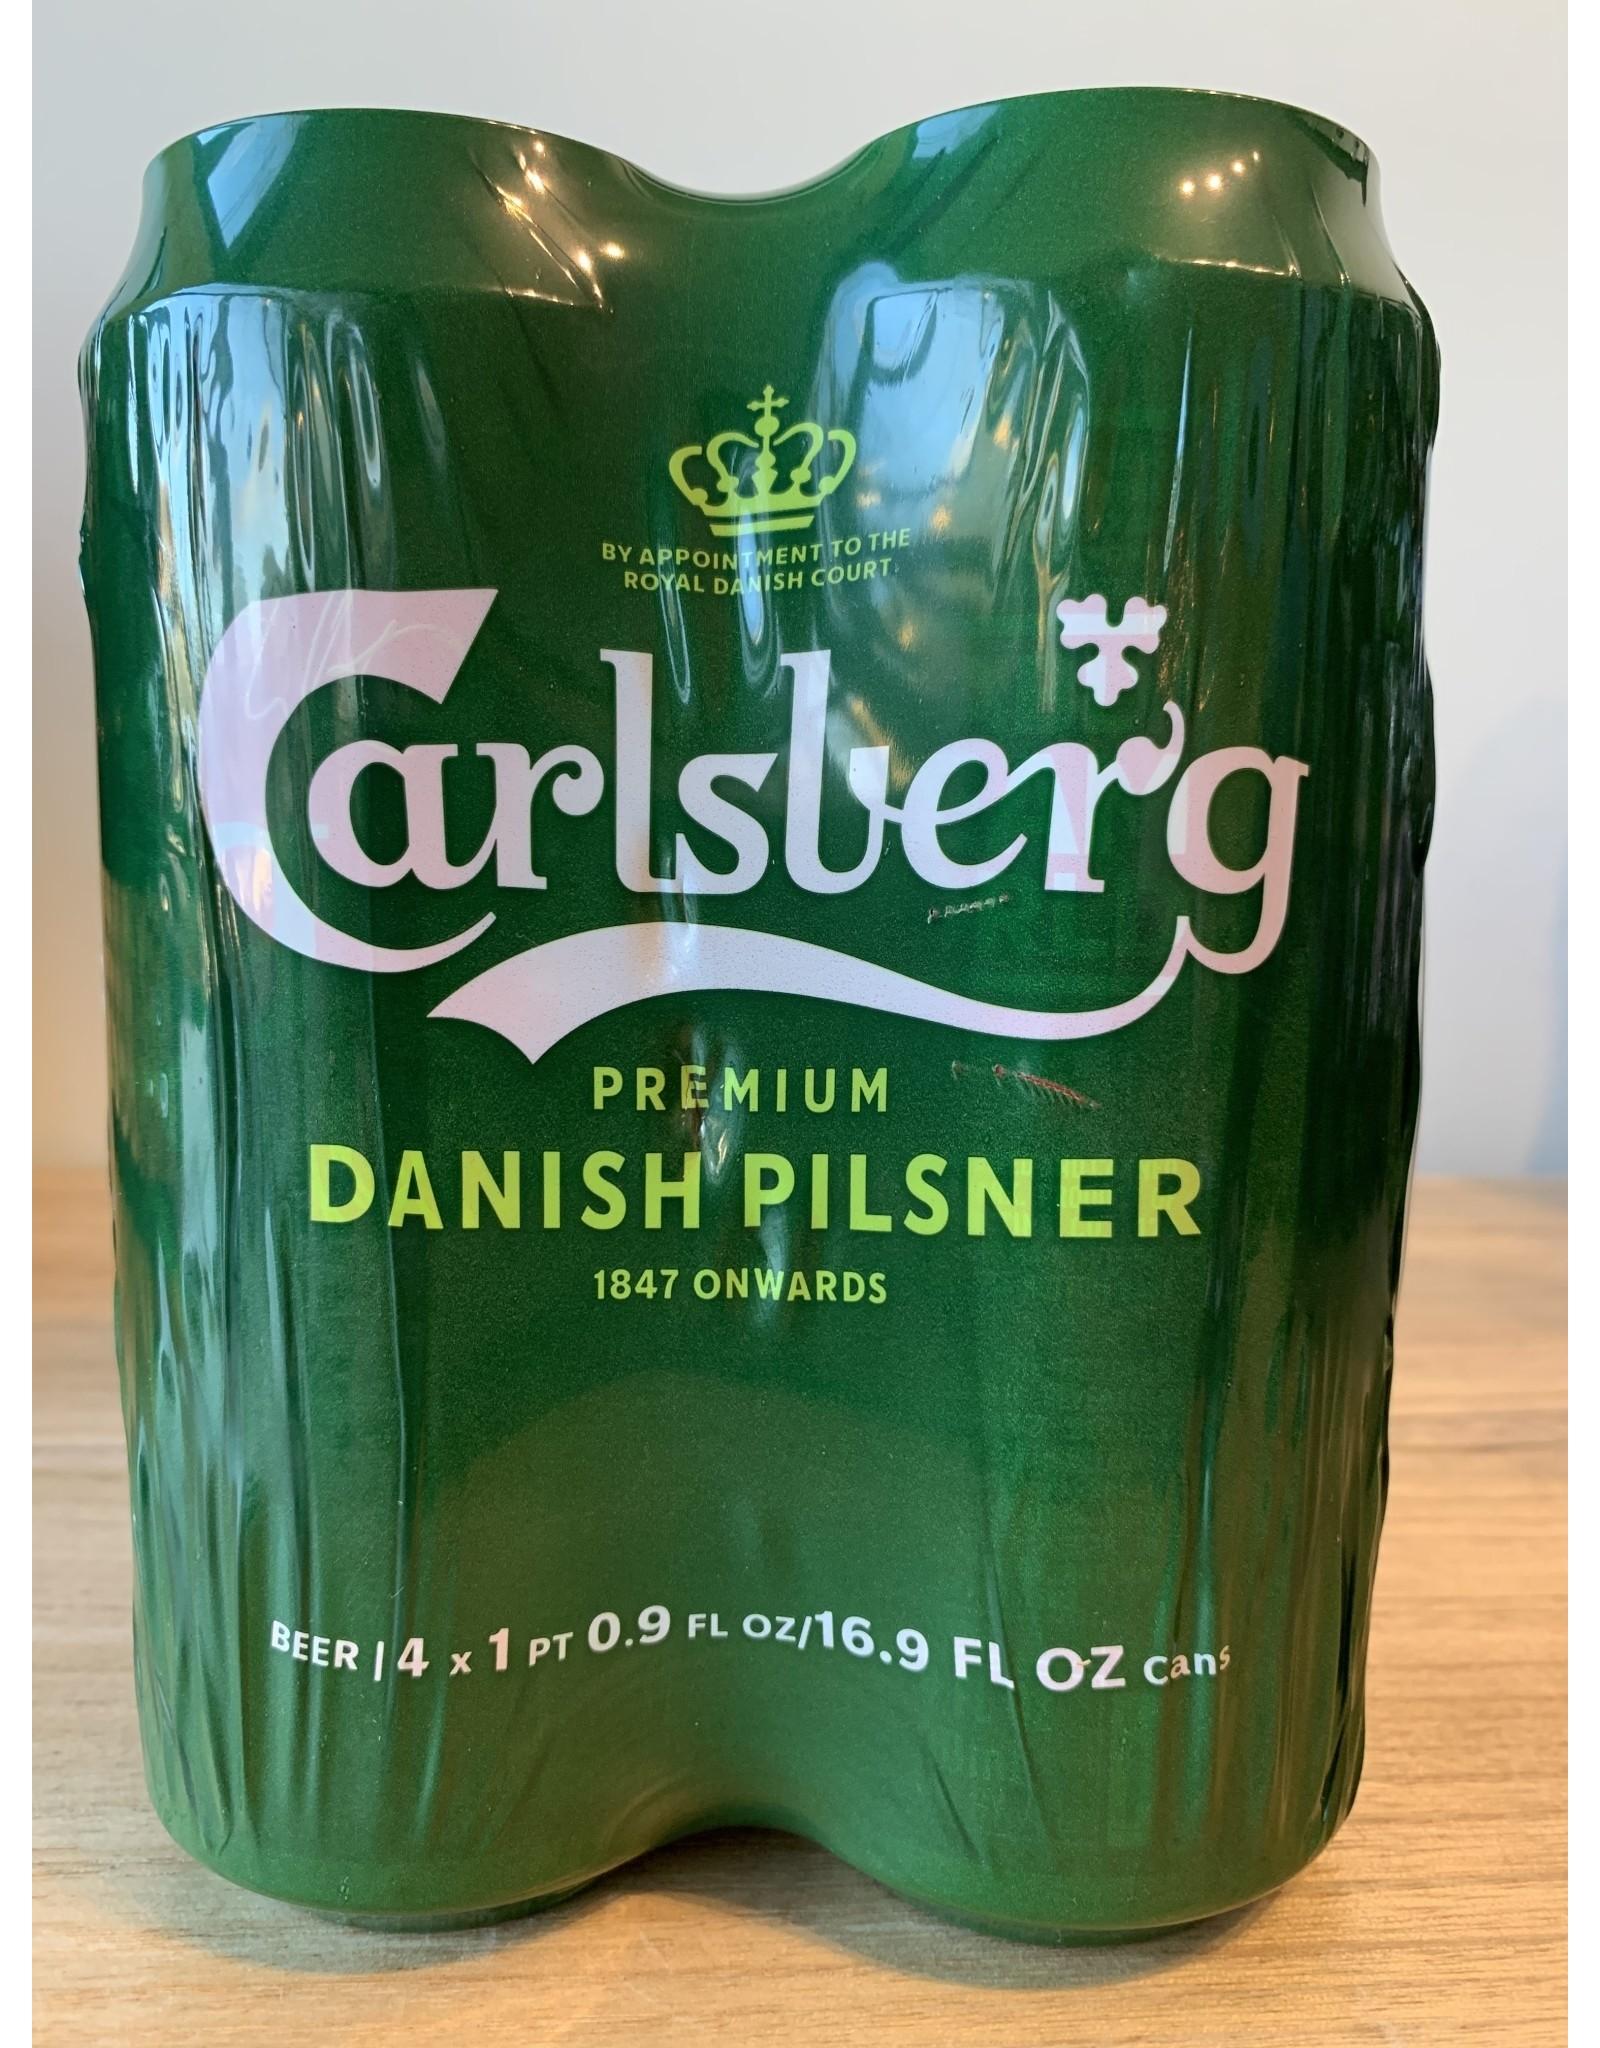 Carlsberg Carlsberg Danish Pilsner